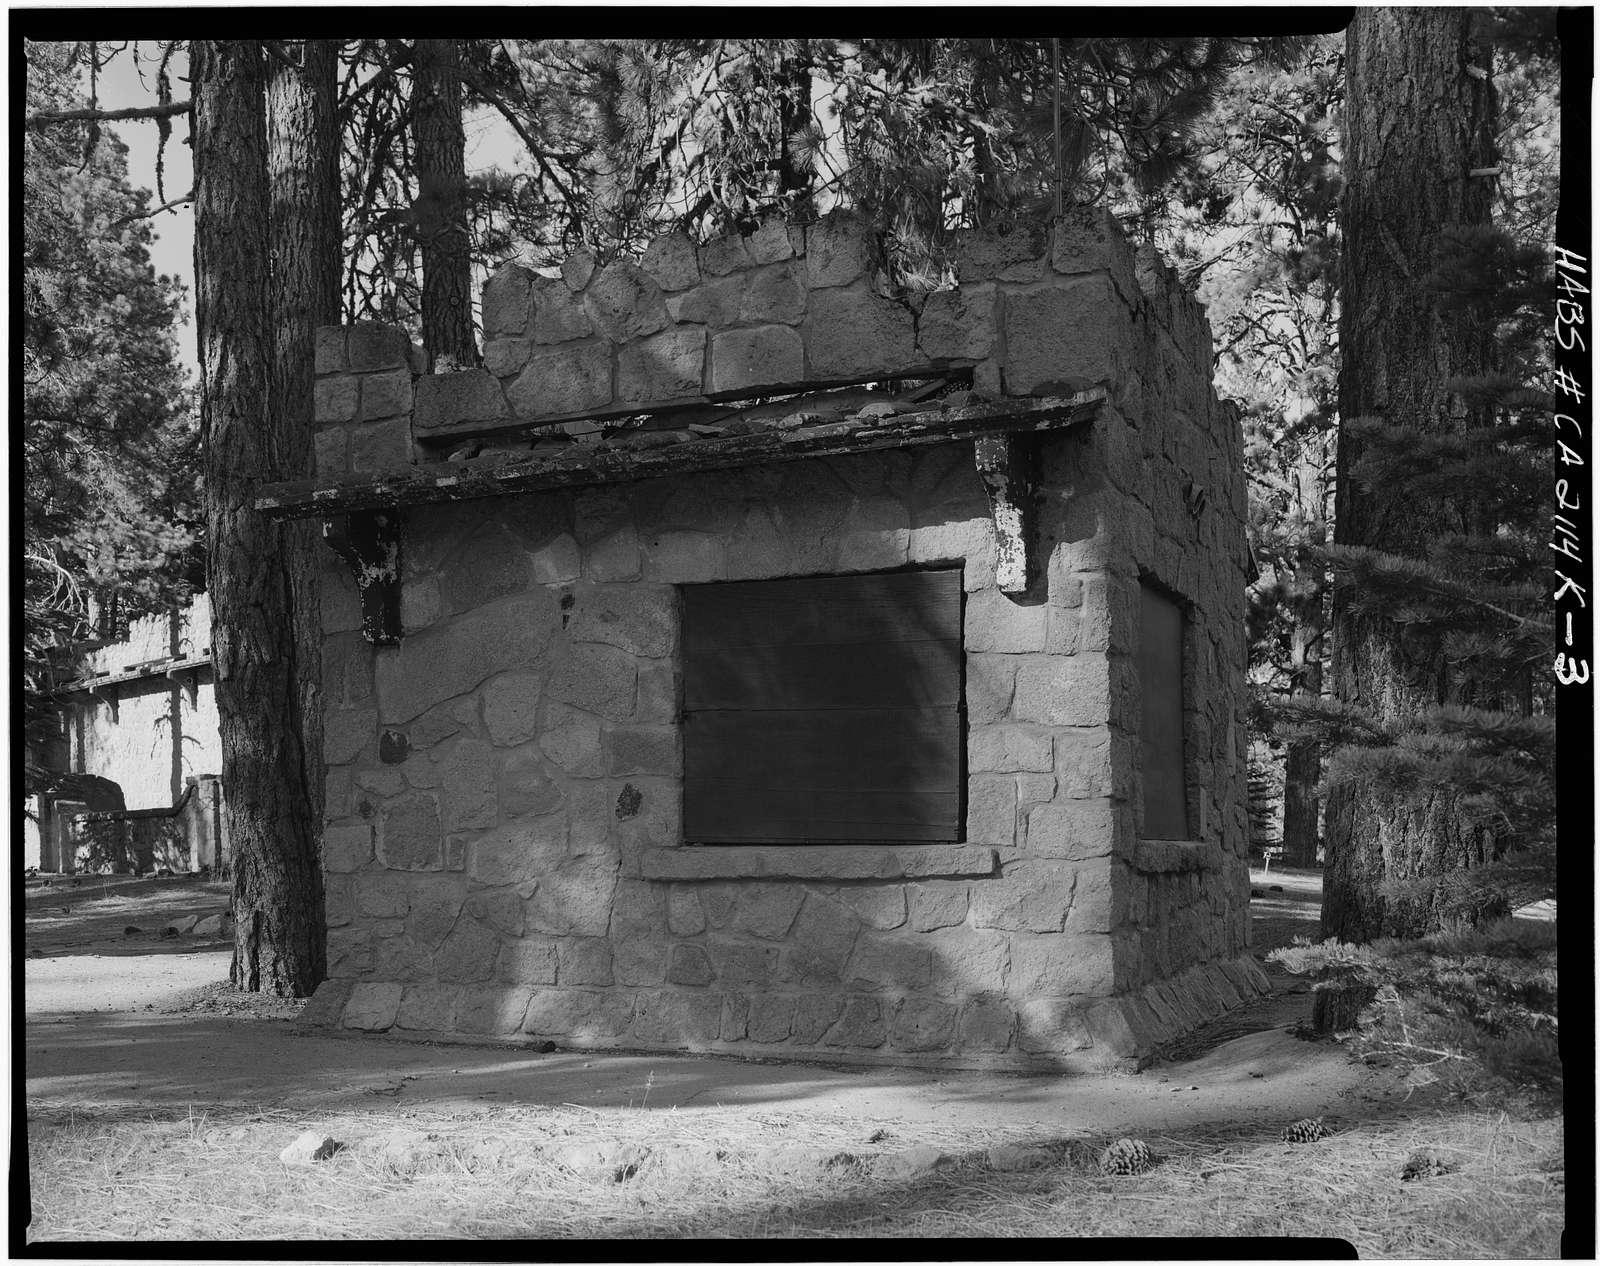 Lassen Volcanic National Park, Loomis Seismograph Station, Mineral, Tehama County, CA